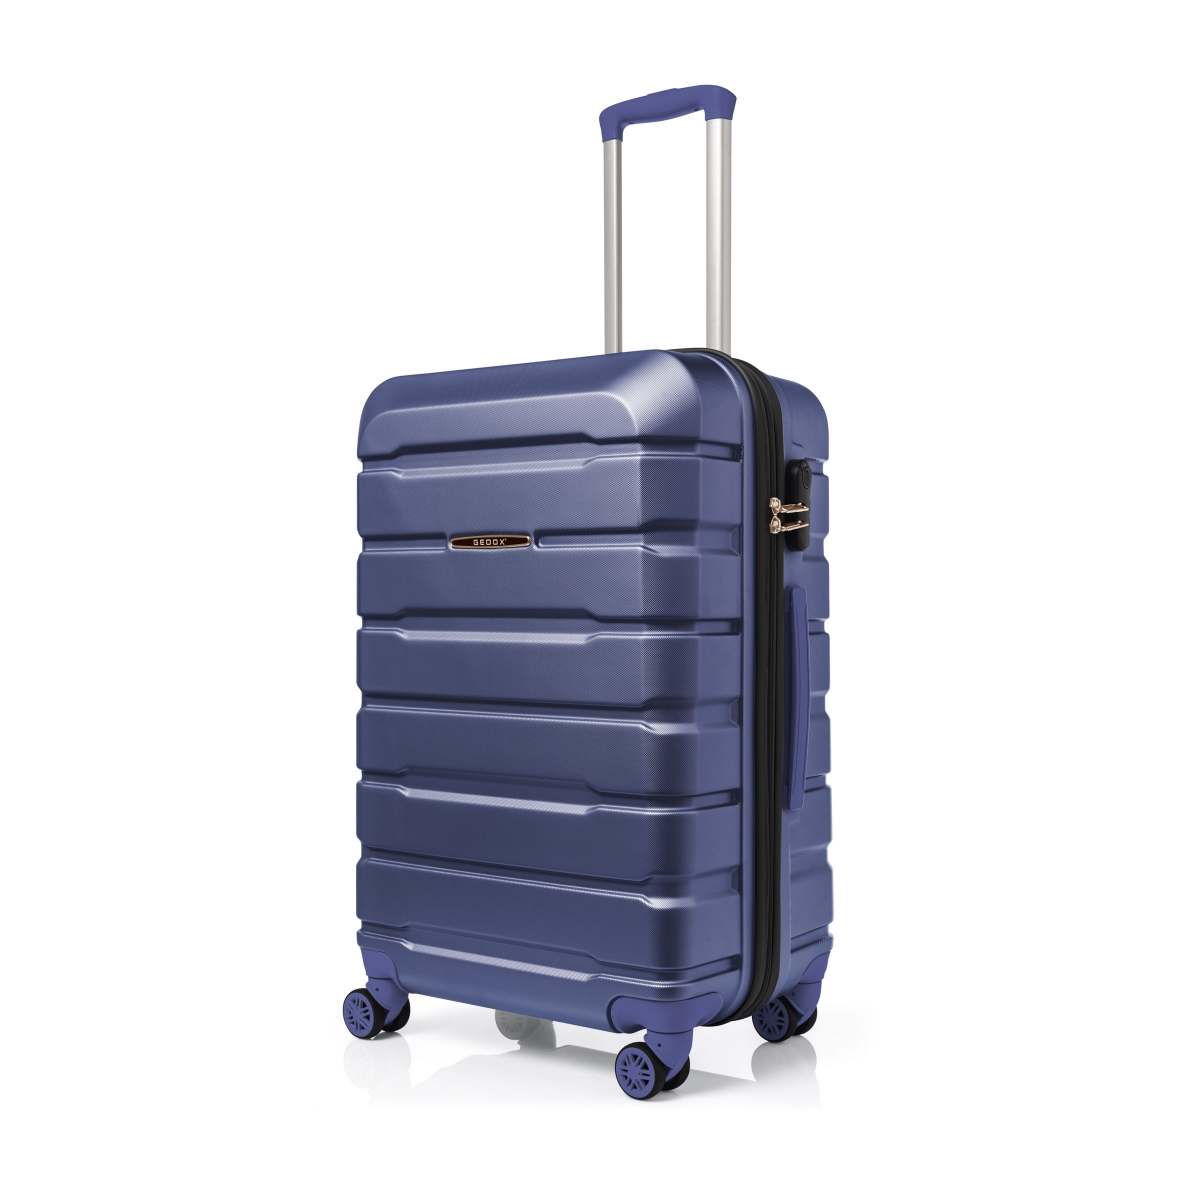 Gedox Abs Premium Tonaton 3'lü Valiz Seyahat Seti - Model:500.05 Çivit Mavi